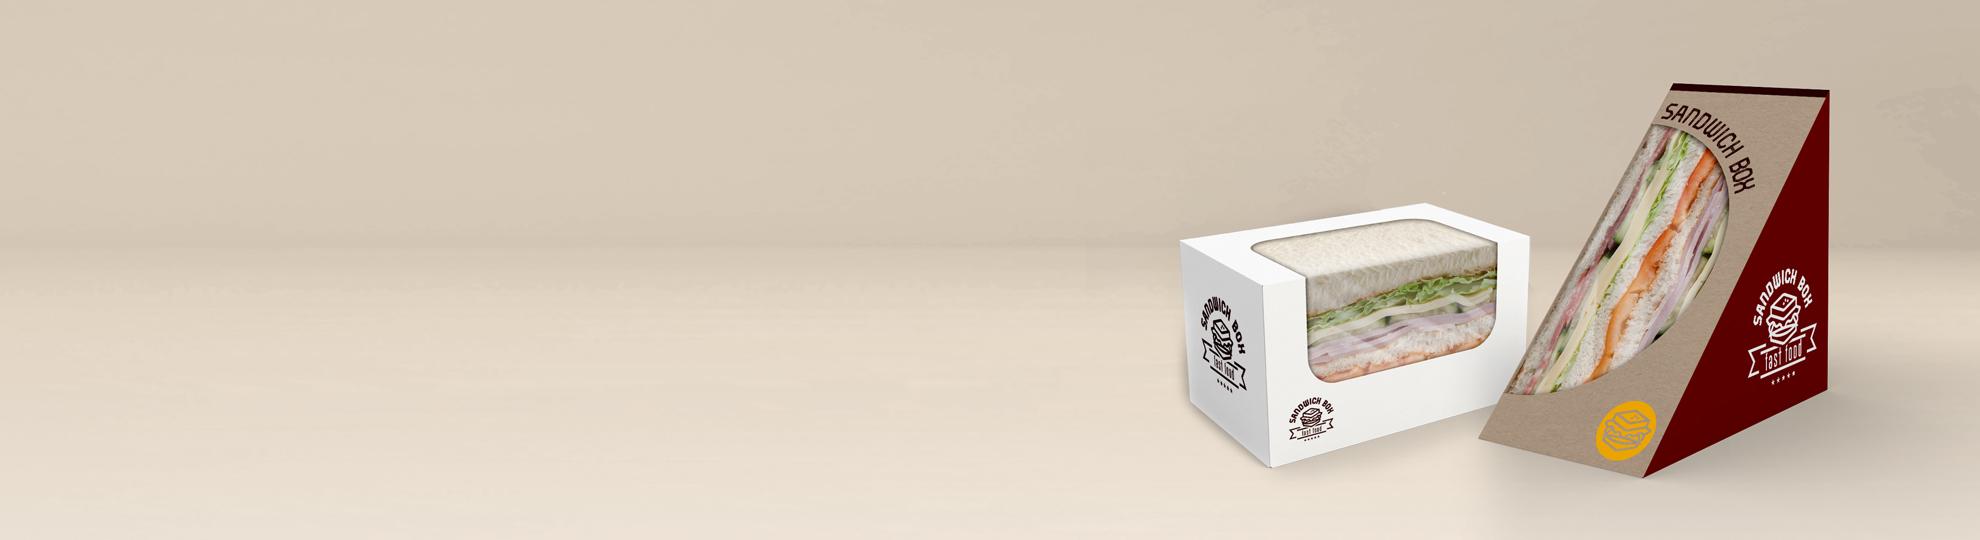 Emballage sandwich publicitaire